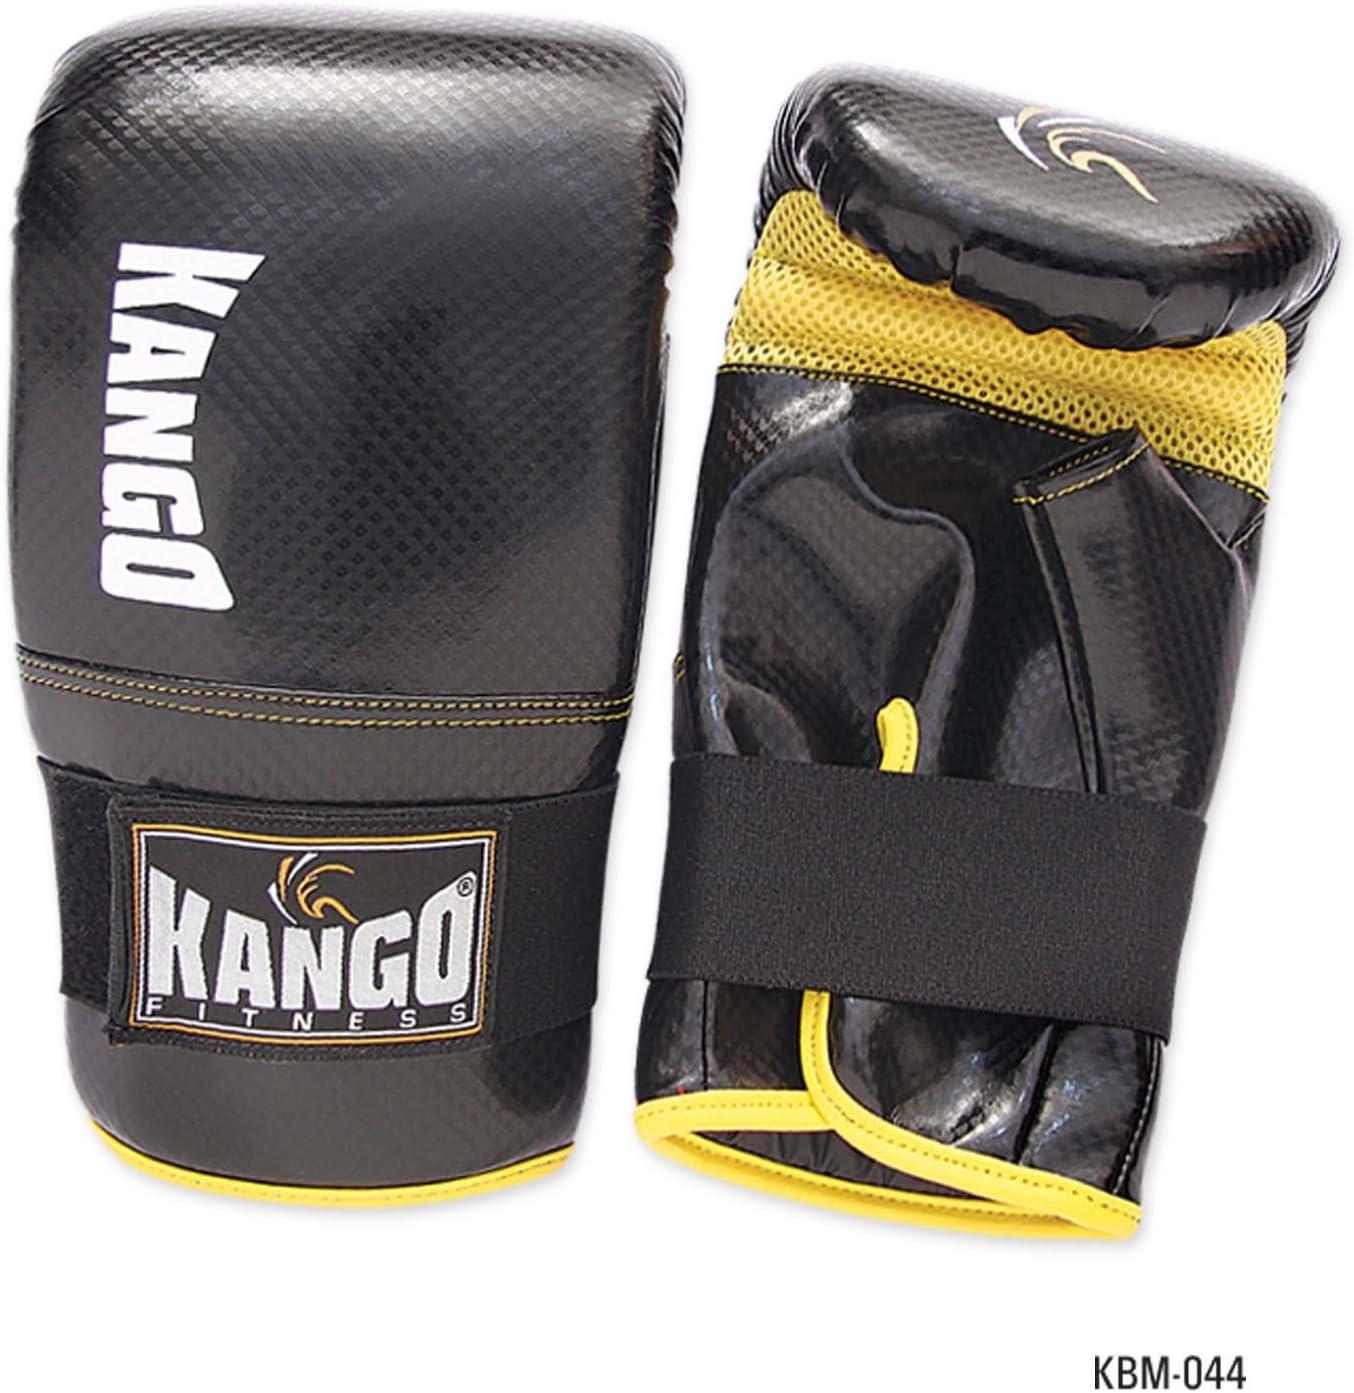 Kango Fitness Pro PU Boxing Gloves MMA Muay Thai Training Sparring Workout